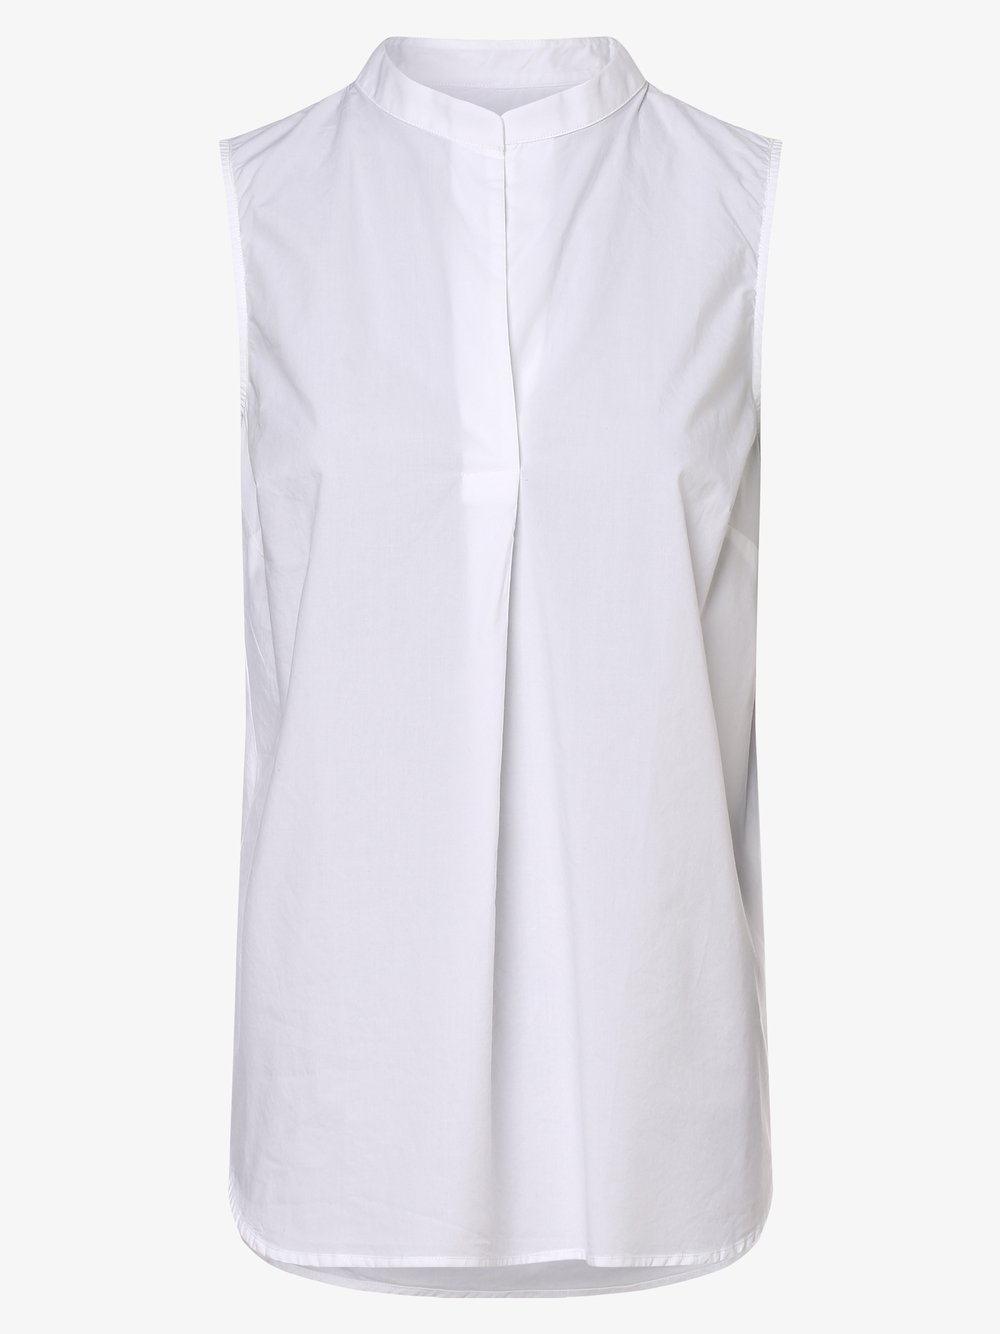 0039 Italy – Damska bluzka bez rękawów – Derry, biały Van Graaf 464298-0001